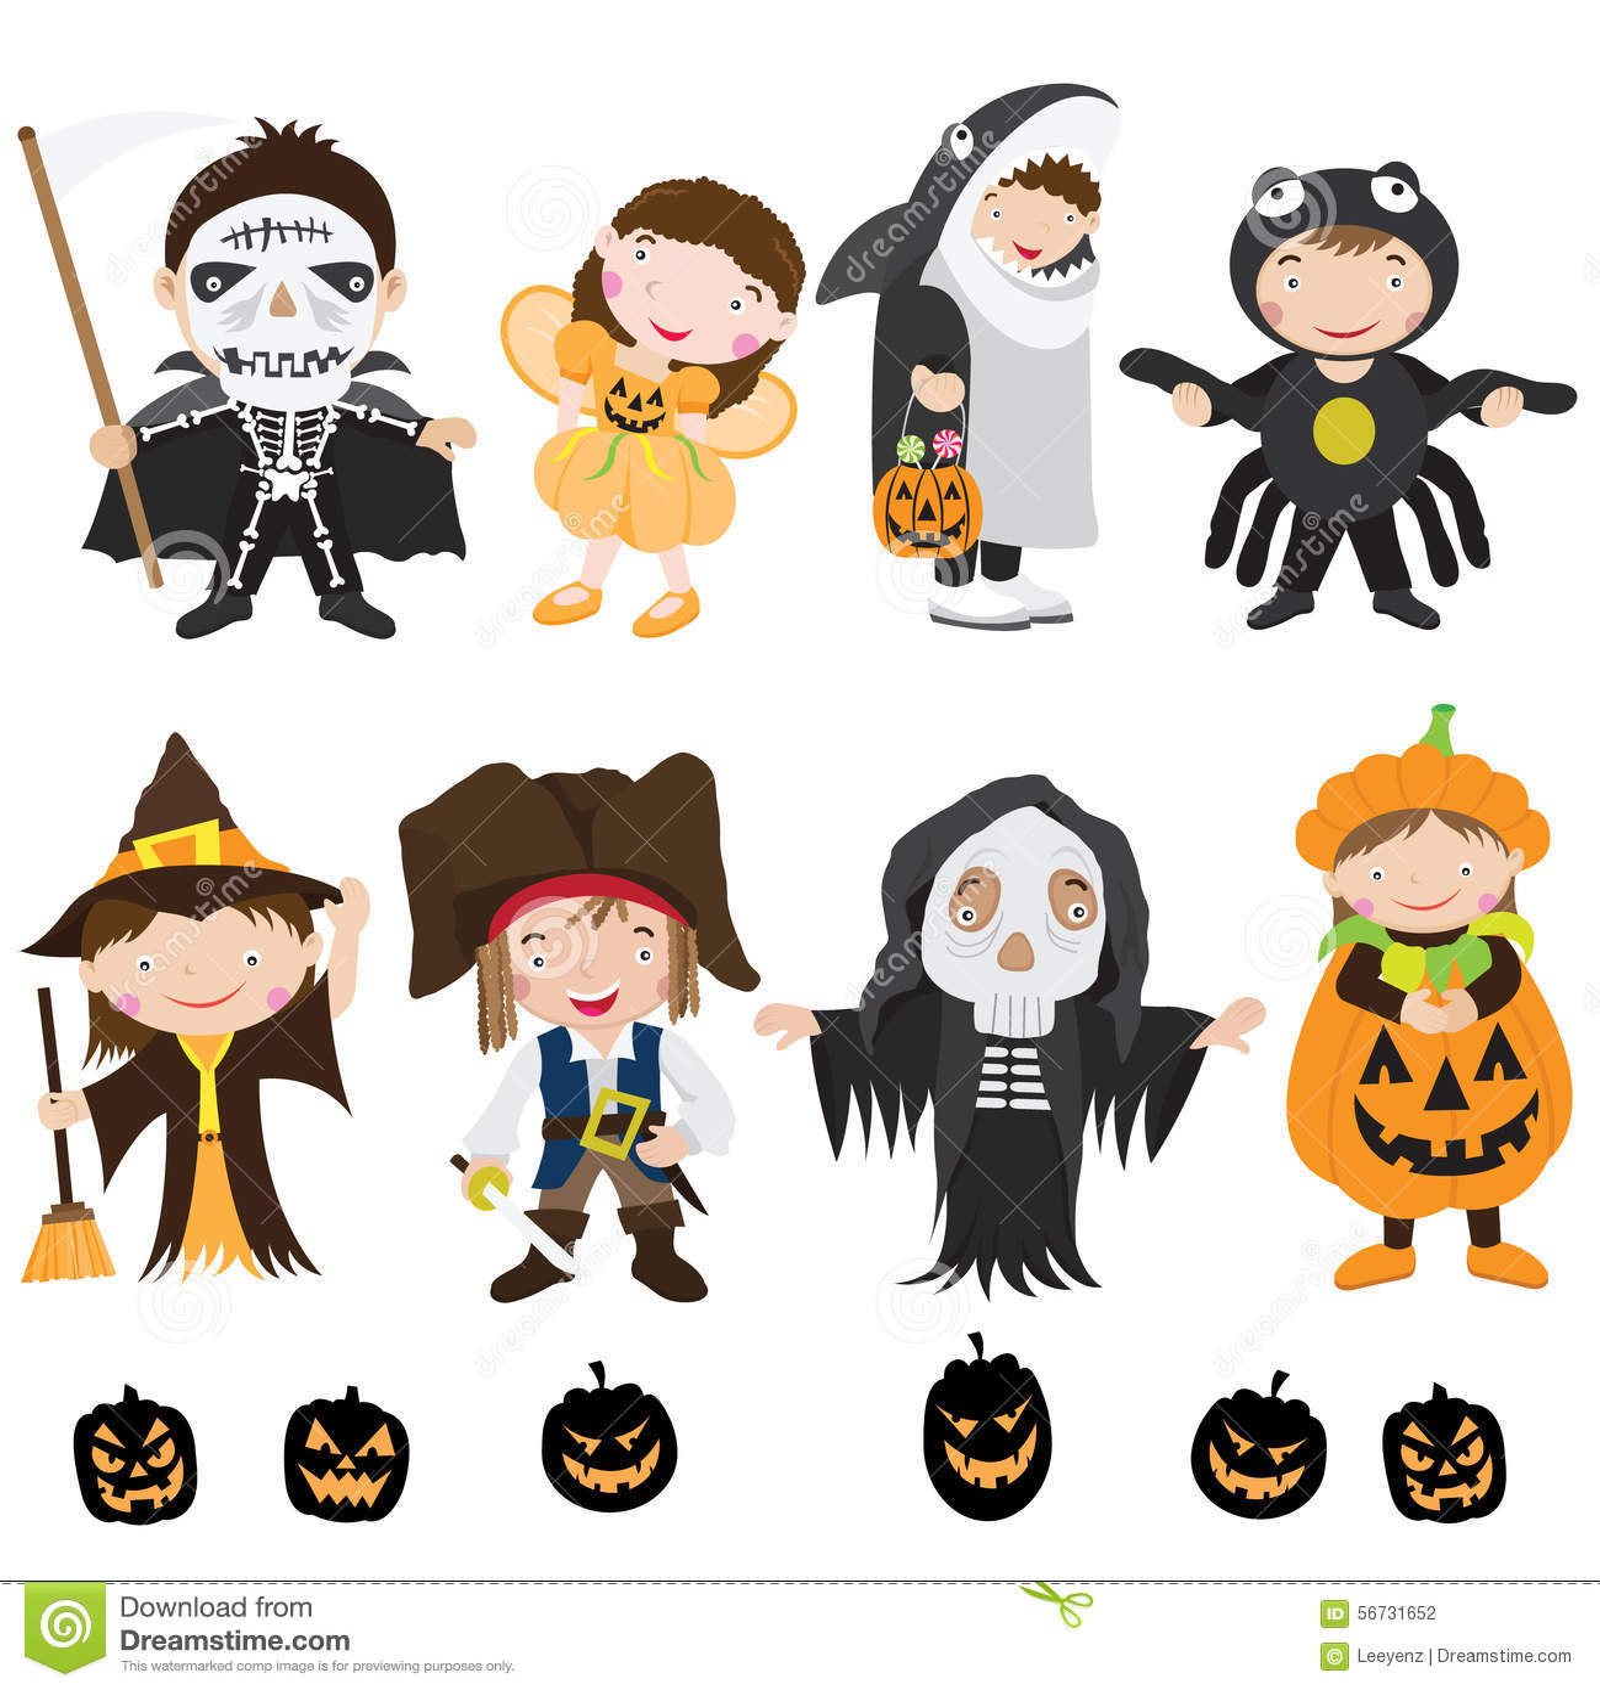 Cute Halloween Characters Costume Vector